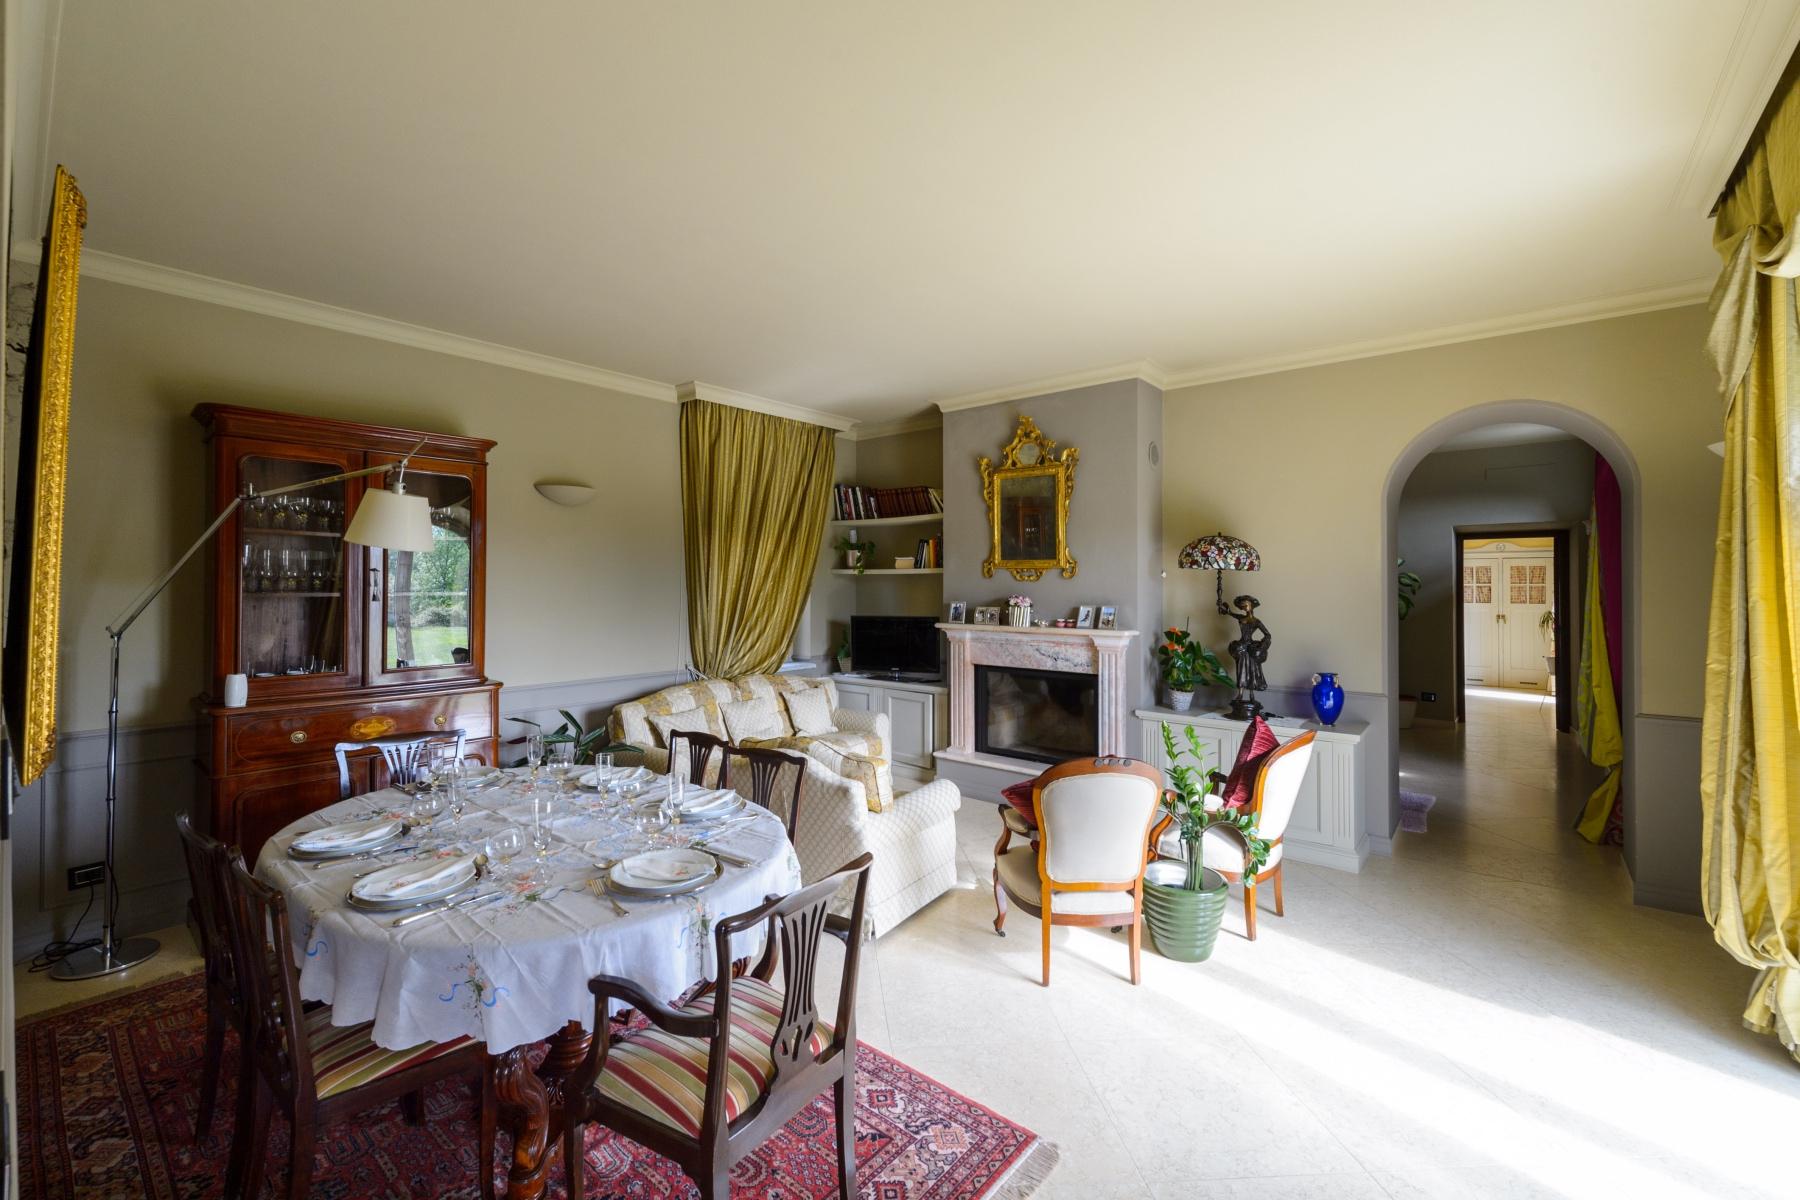 Casa indipendente in Vendita a Agrate Conturbia: 5 locali, 400 mq - Foto 8